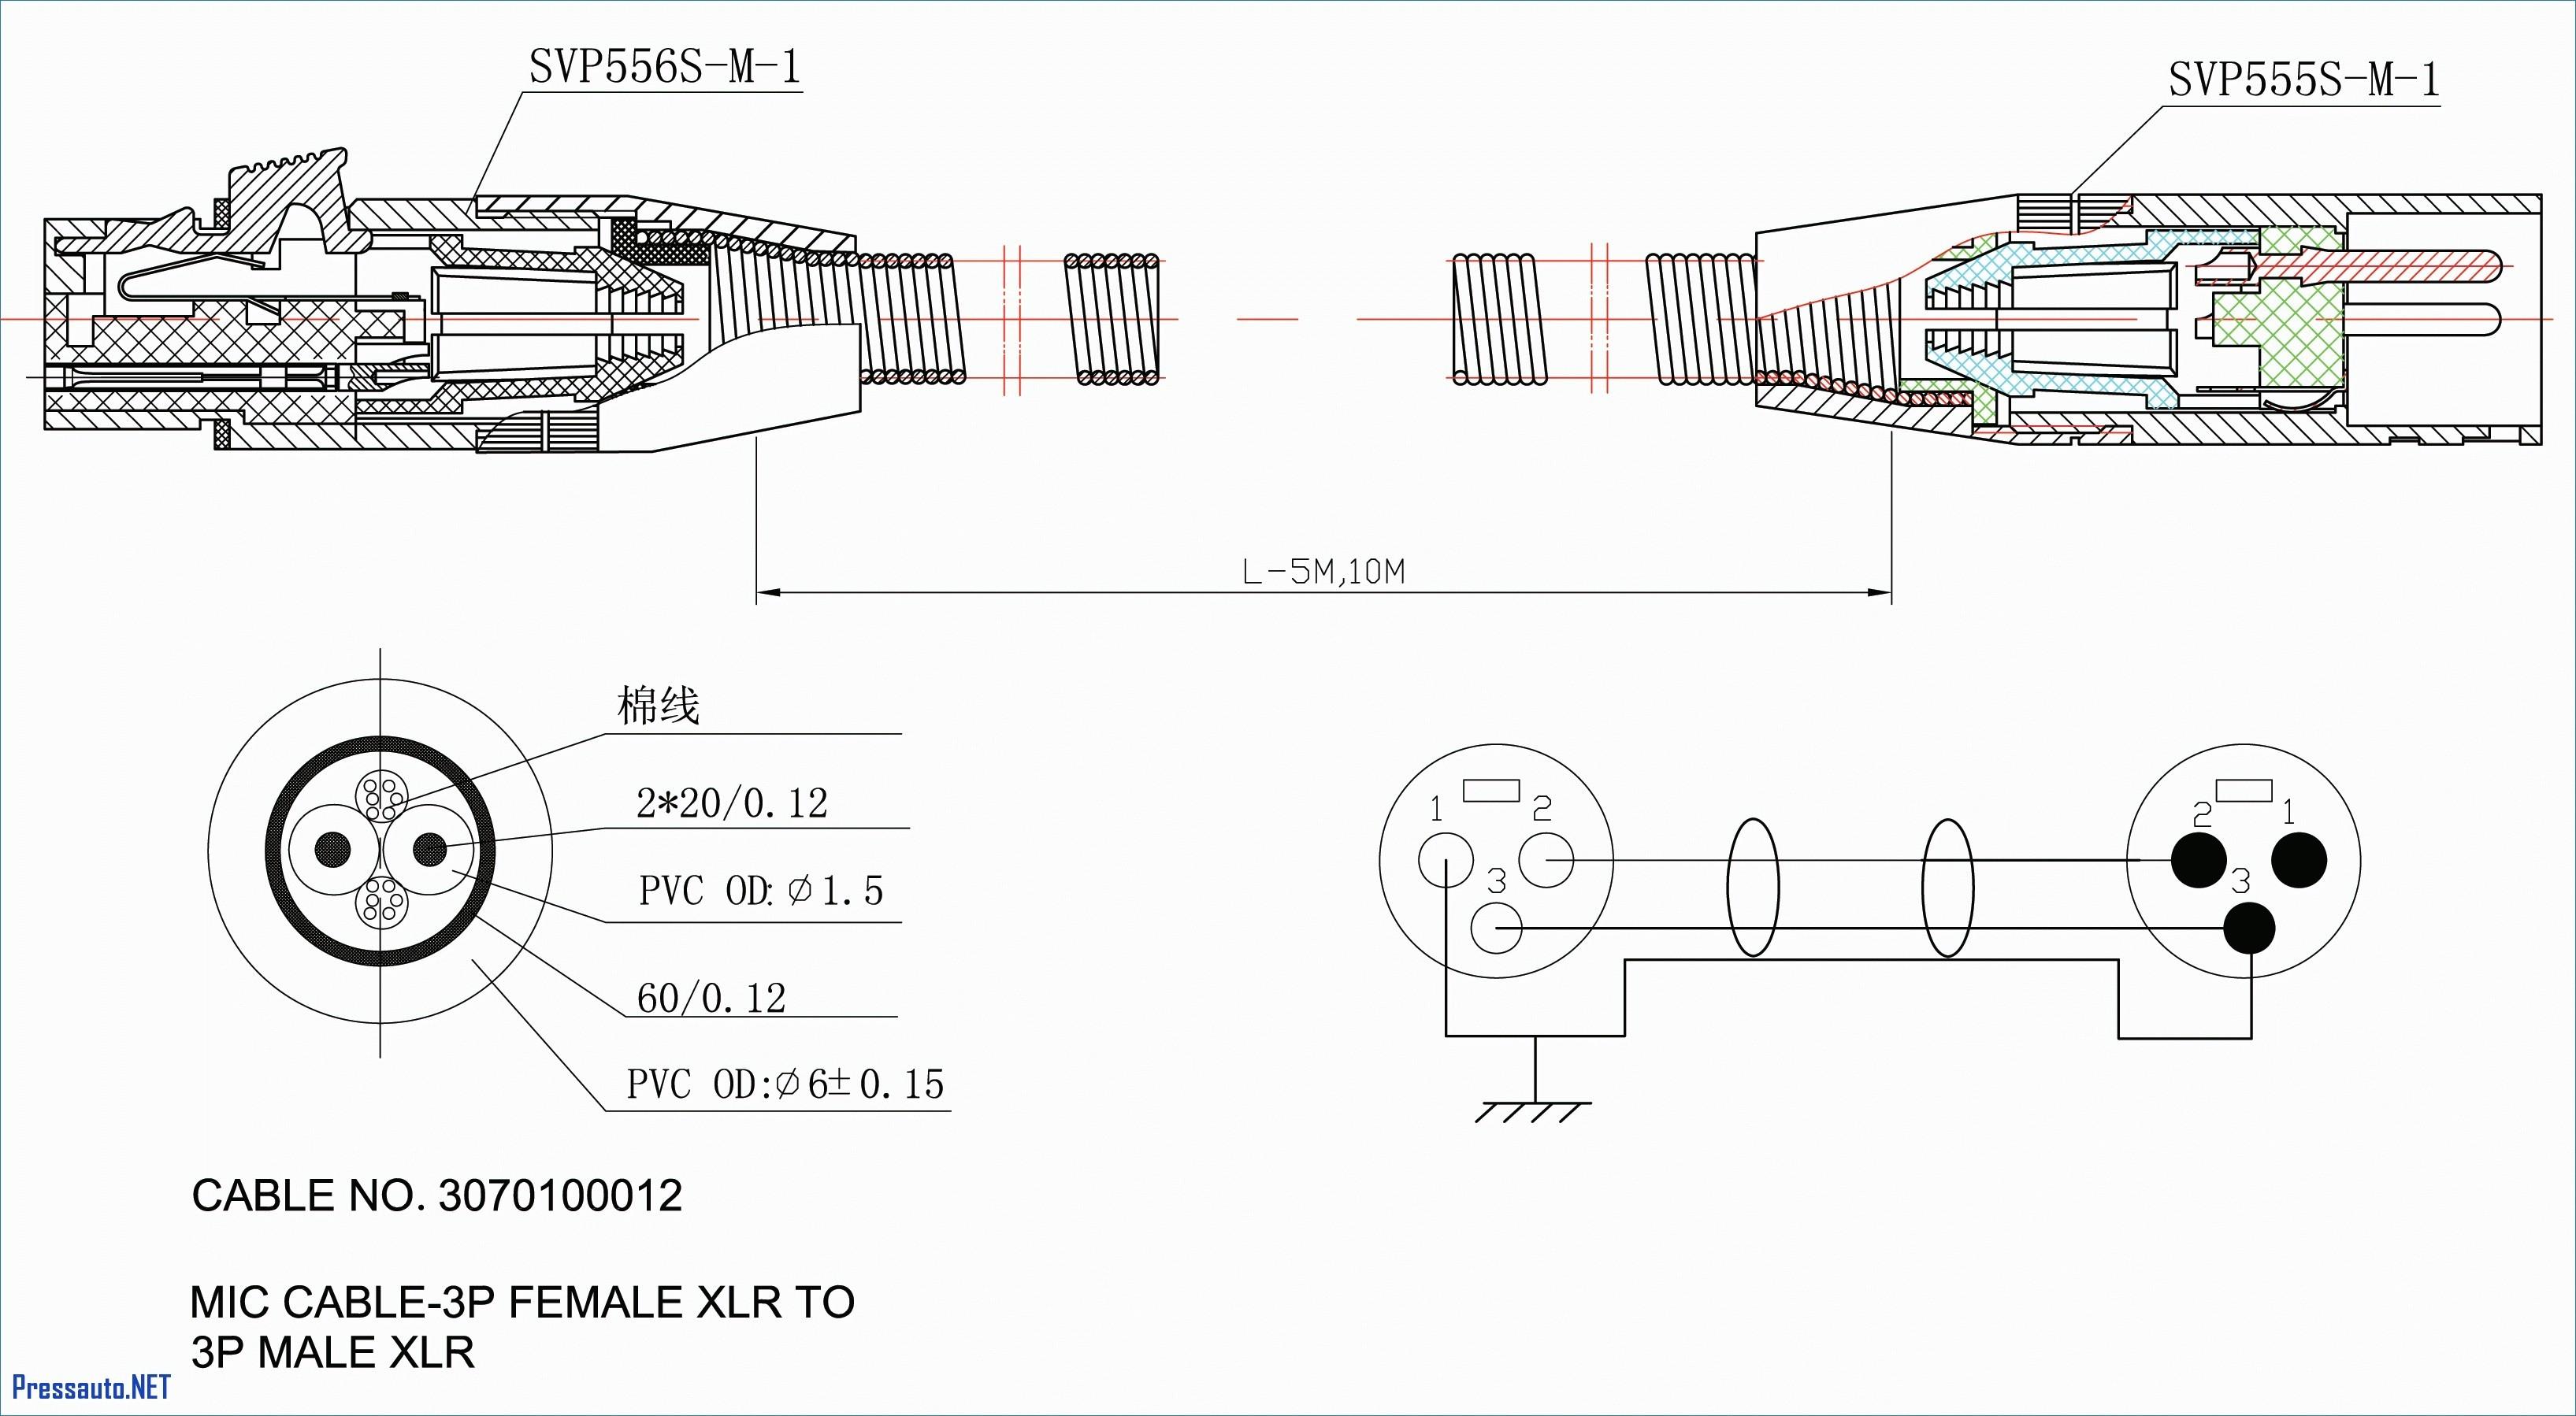 Xbox 360 Power Supply Wiring Diagram 6027f Xbox Wiring Diagram with Labels Of Xbox 360 Power Supply Wiring Diagram